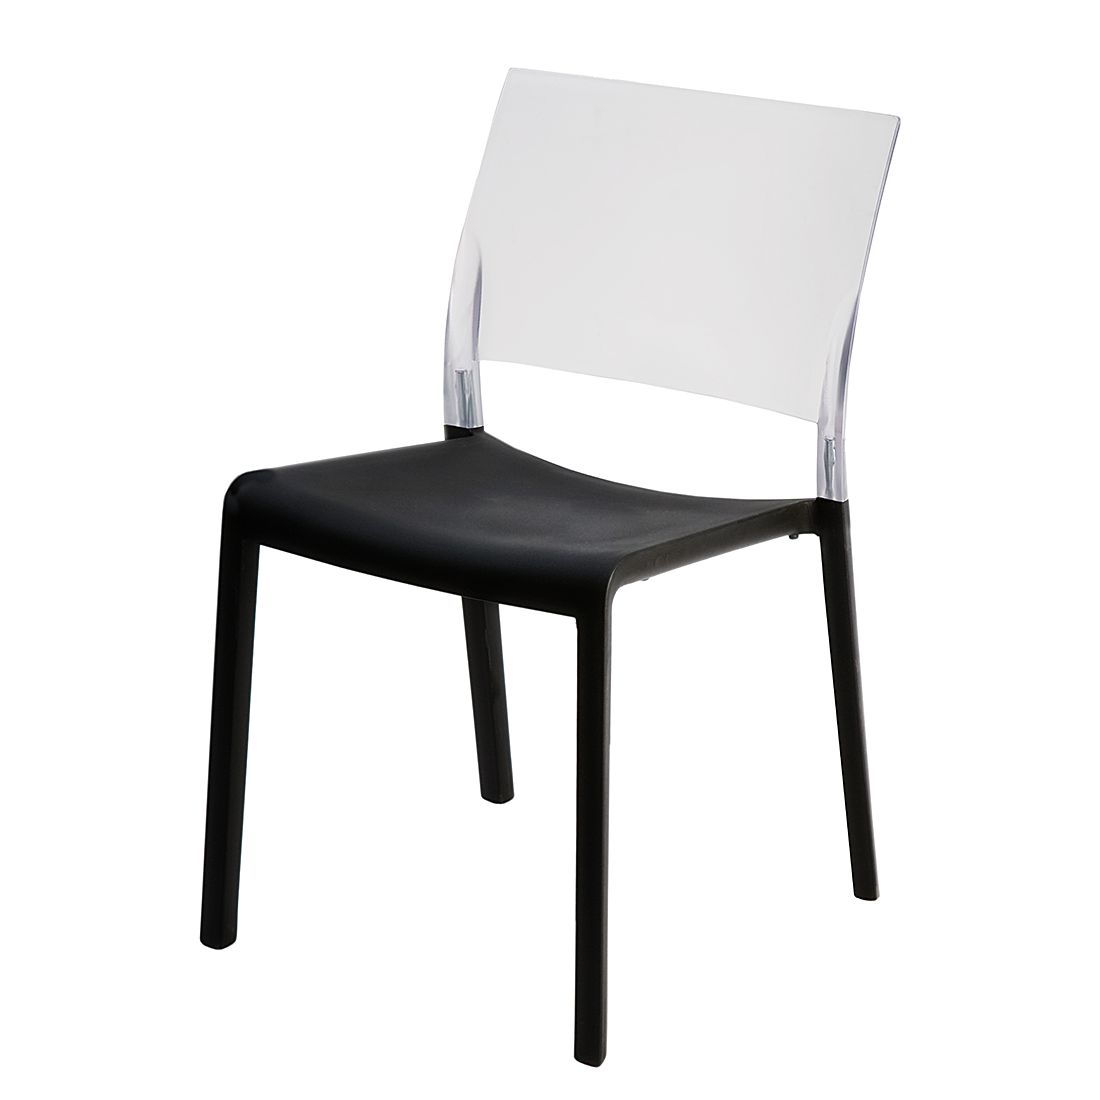 Stuhl transparent sonstige preisvergleiche for Stuhl transparent design